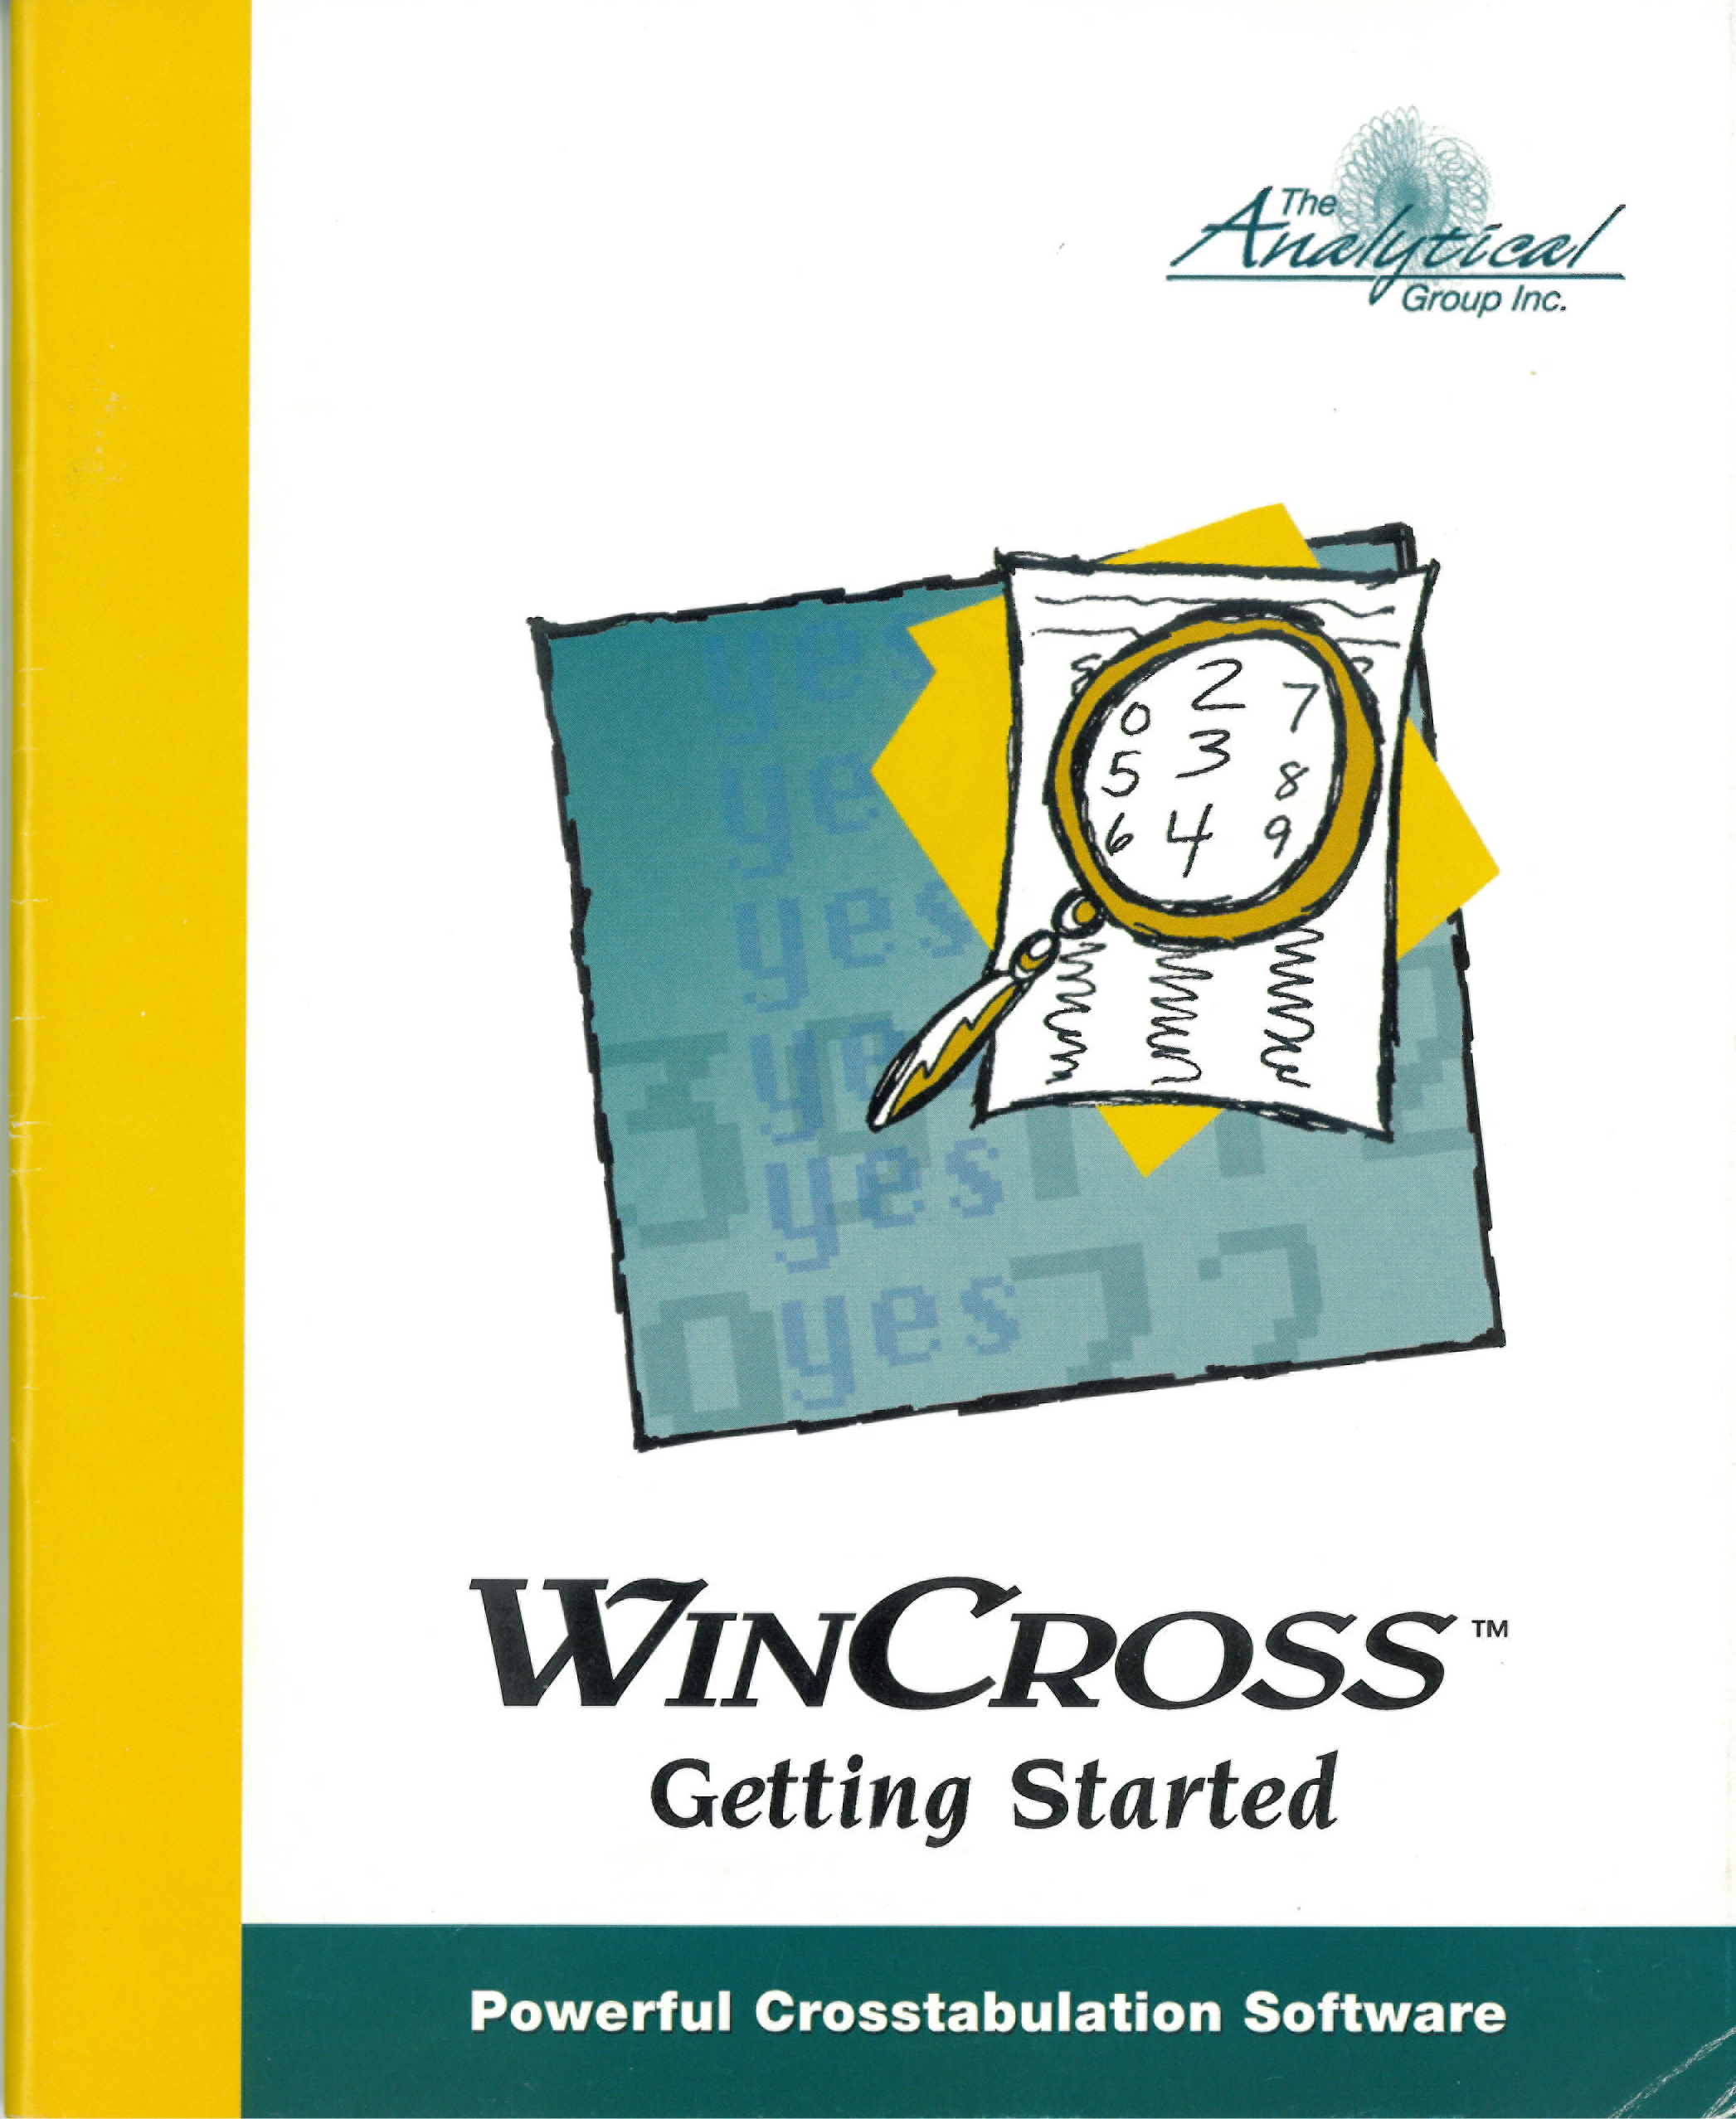 TAG - WinCross GS cvr.png